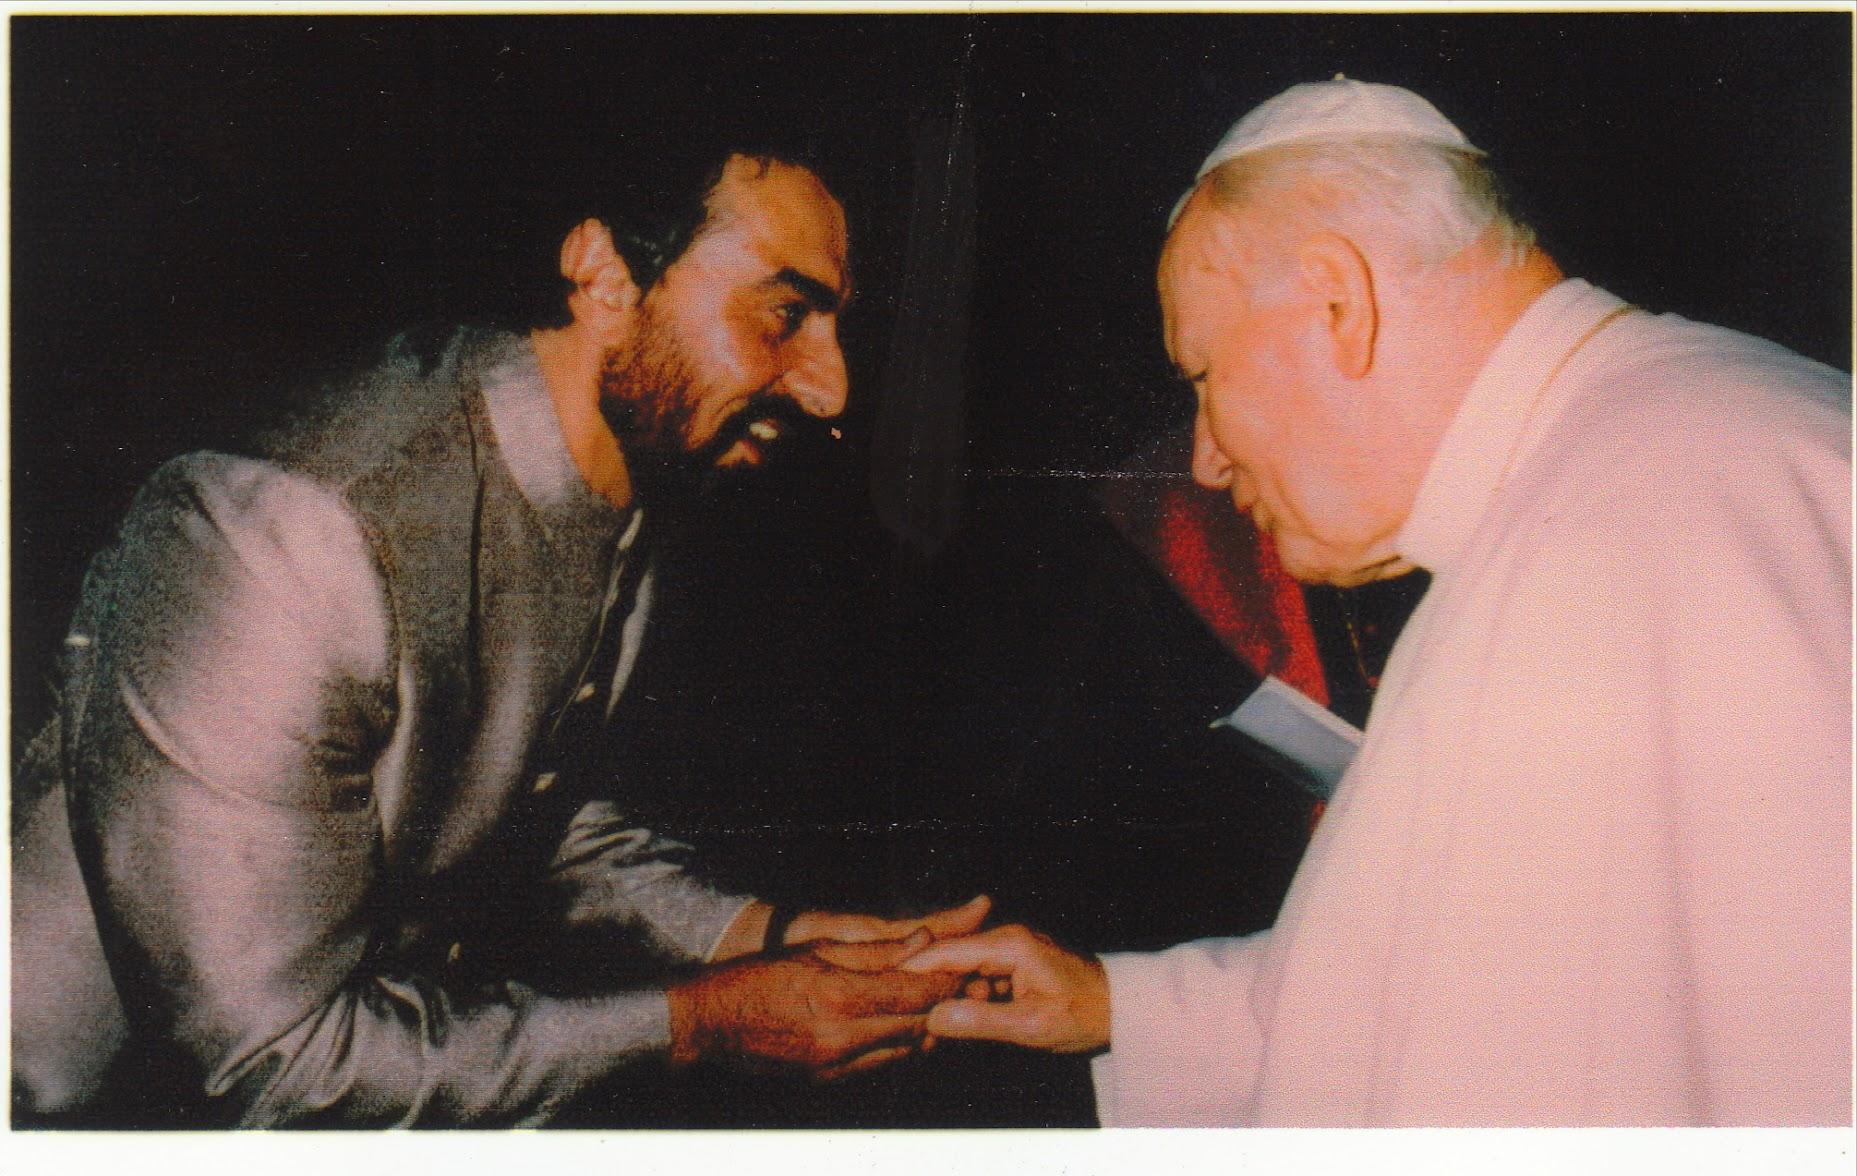 KABIR BEDI w POPE JOHN PAUL